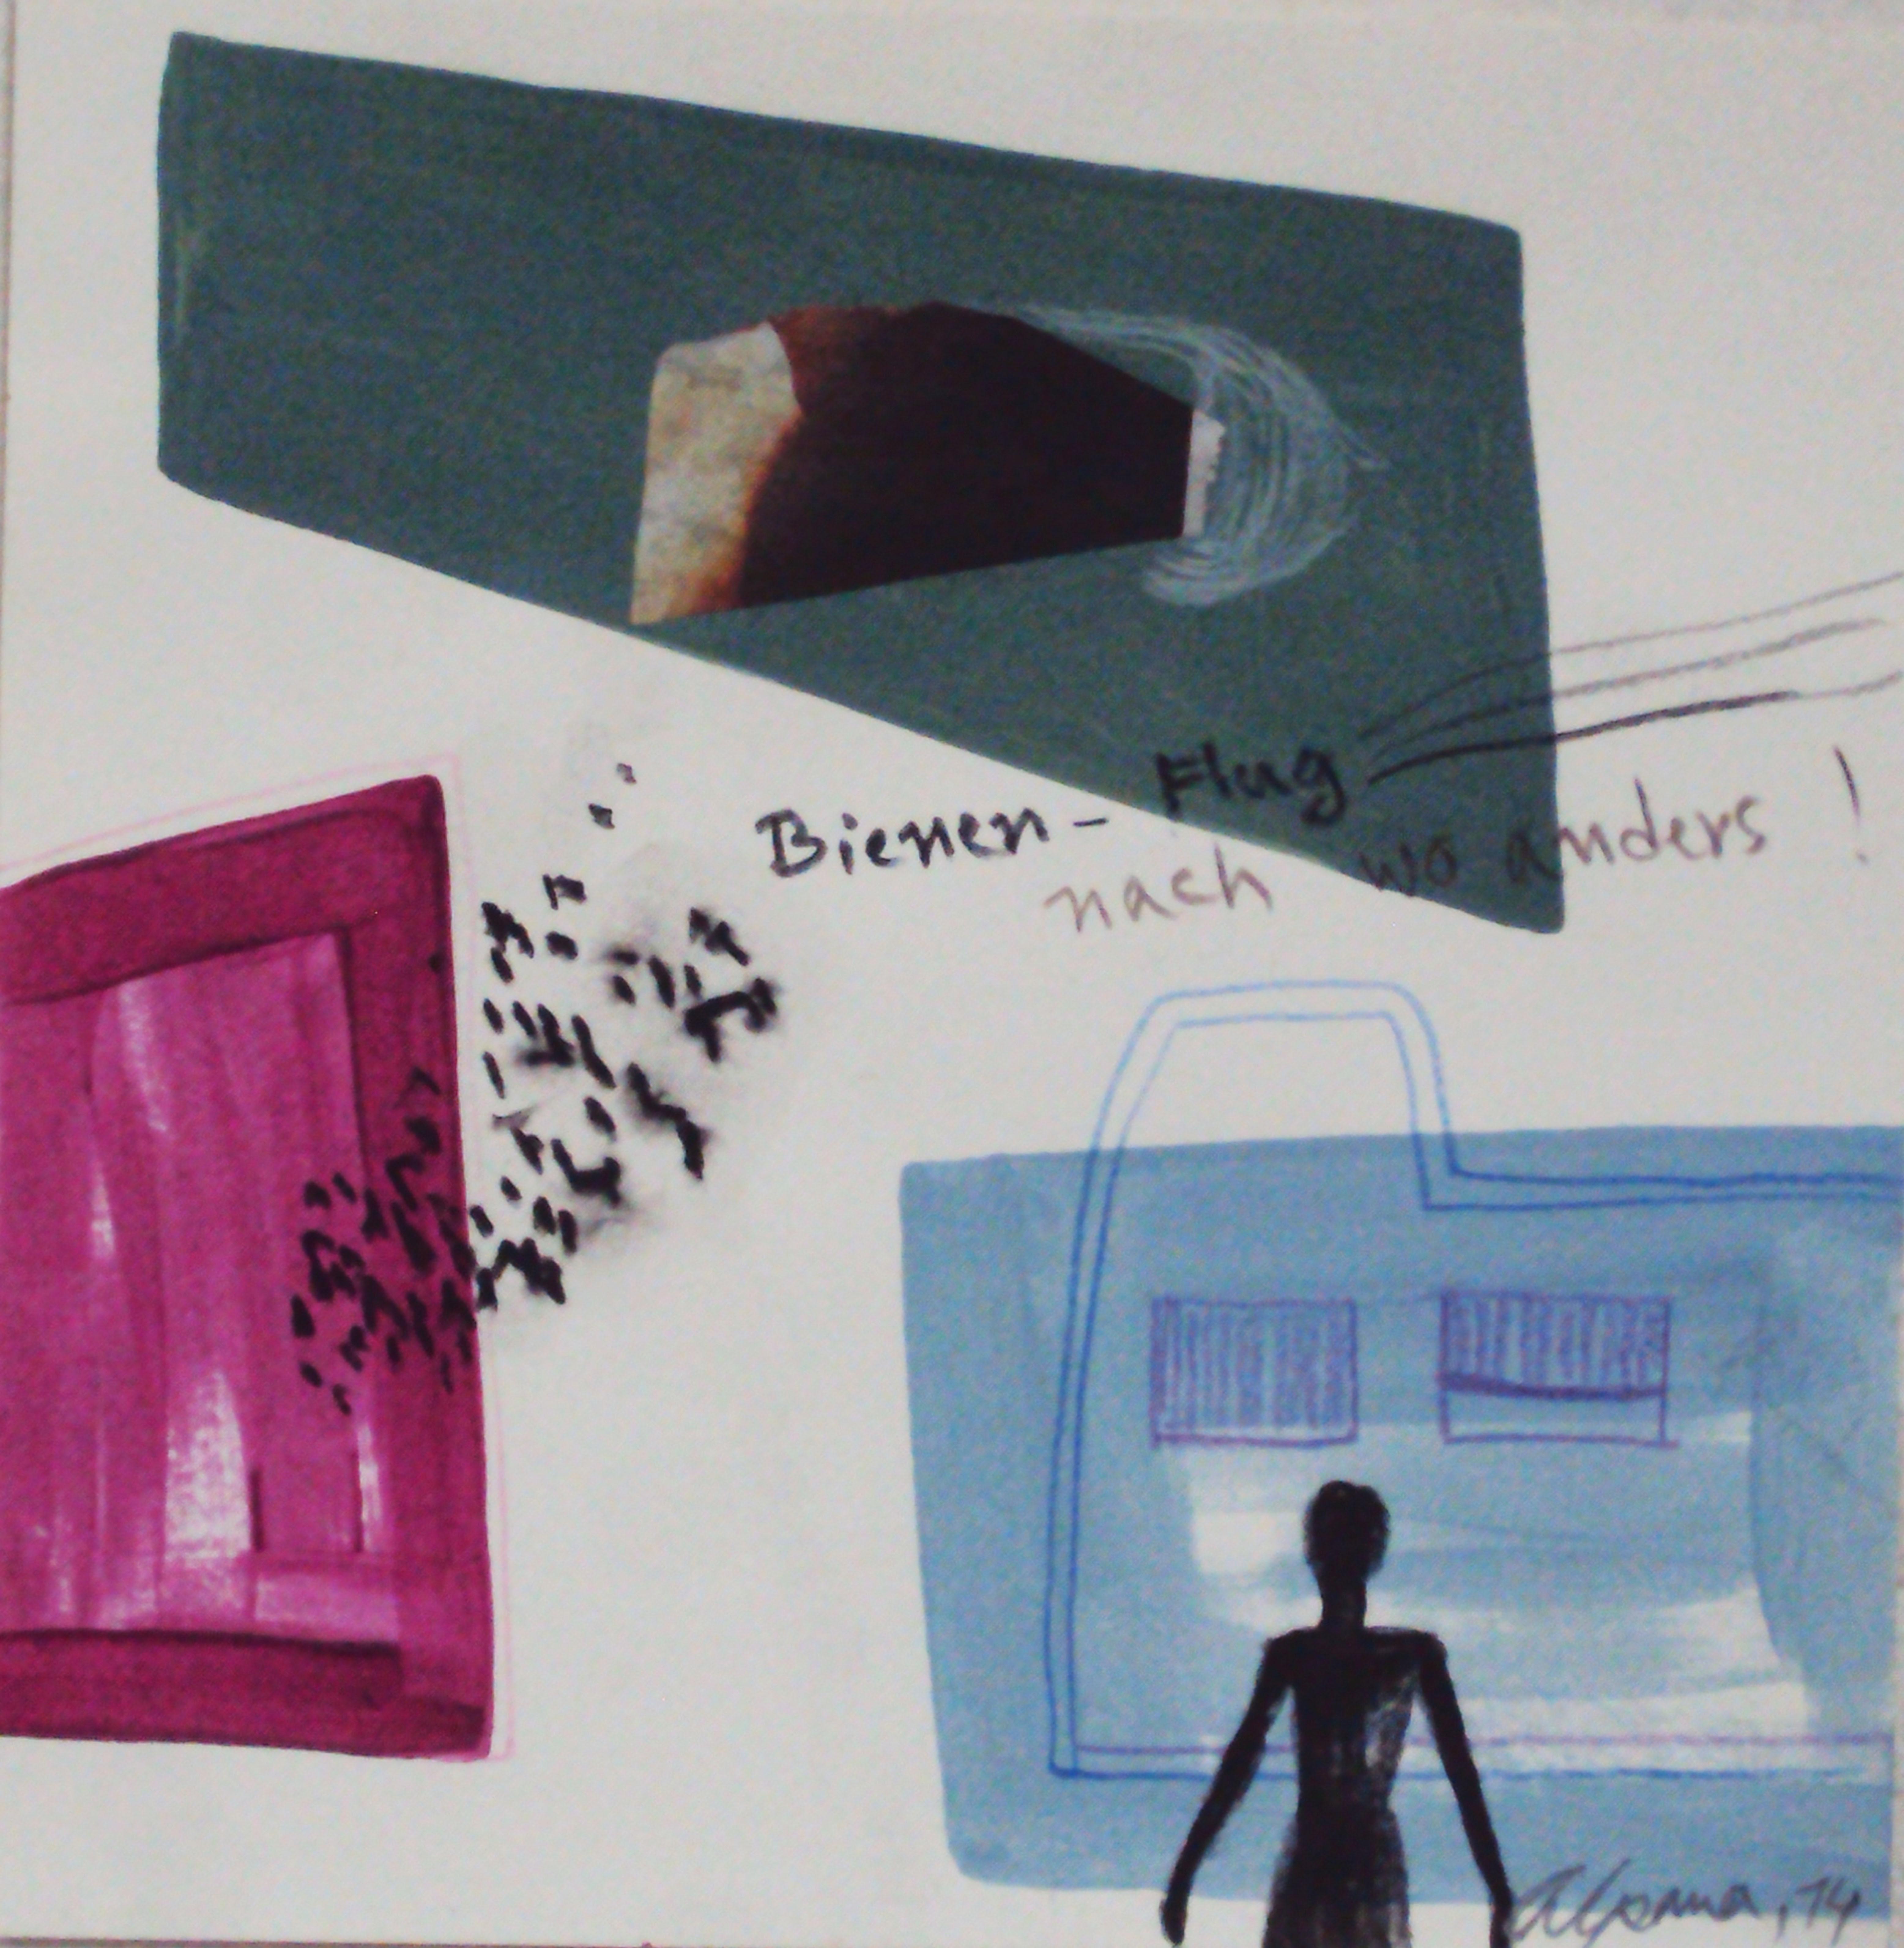 Murshida Arzu Alpana, Bienen Flug ! 2014, Mischtechnik auf Papier, 20 x 20 cm